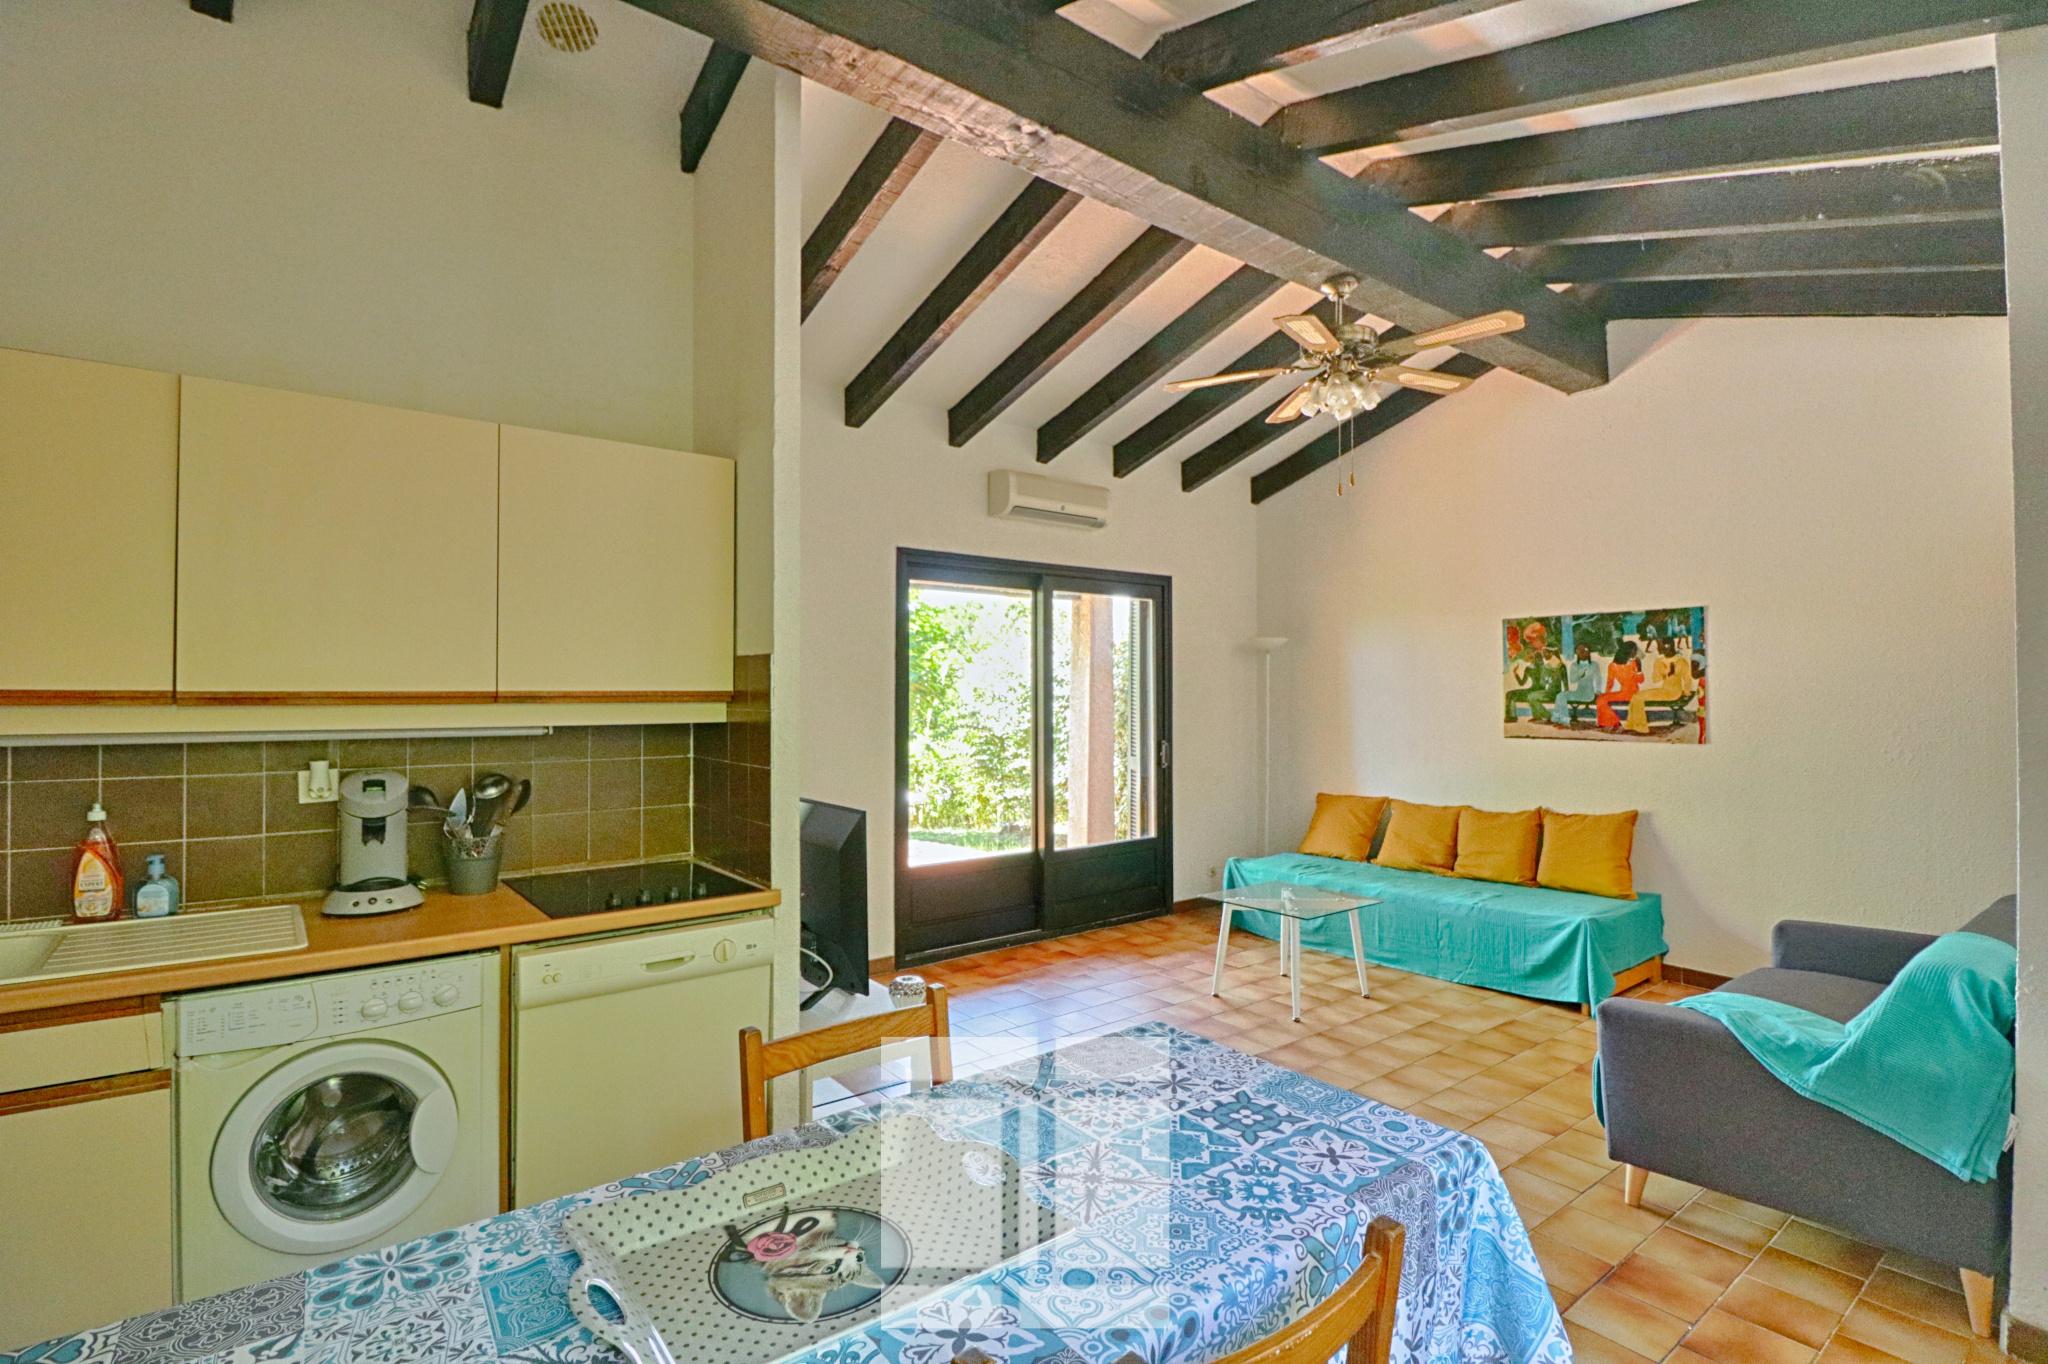 EXCLUSIVITE - Porticcio - Petite maison avec jardin